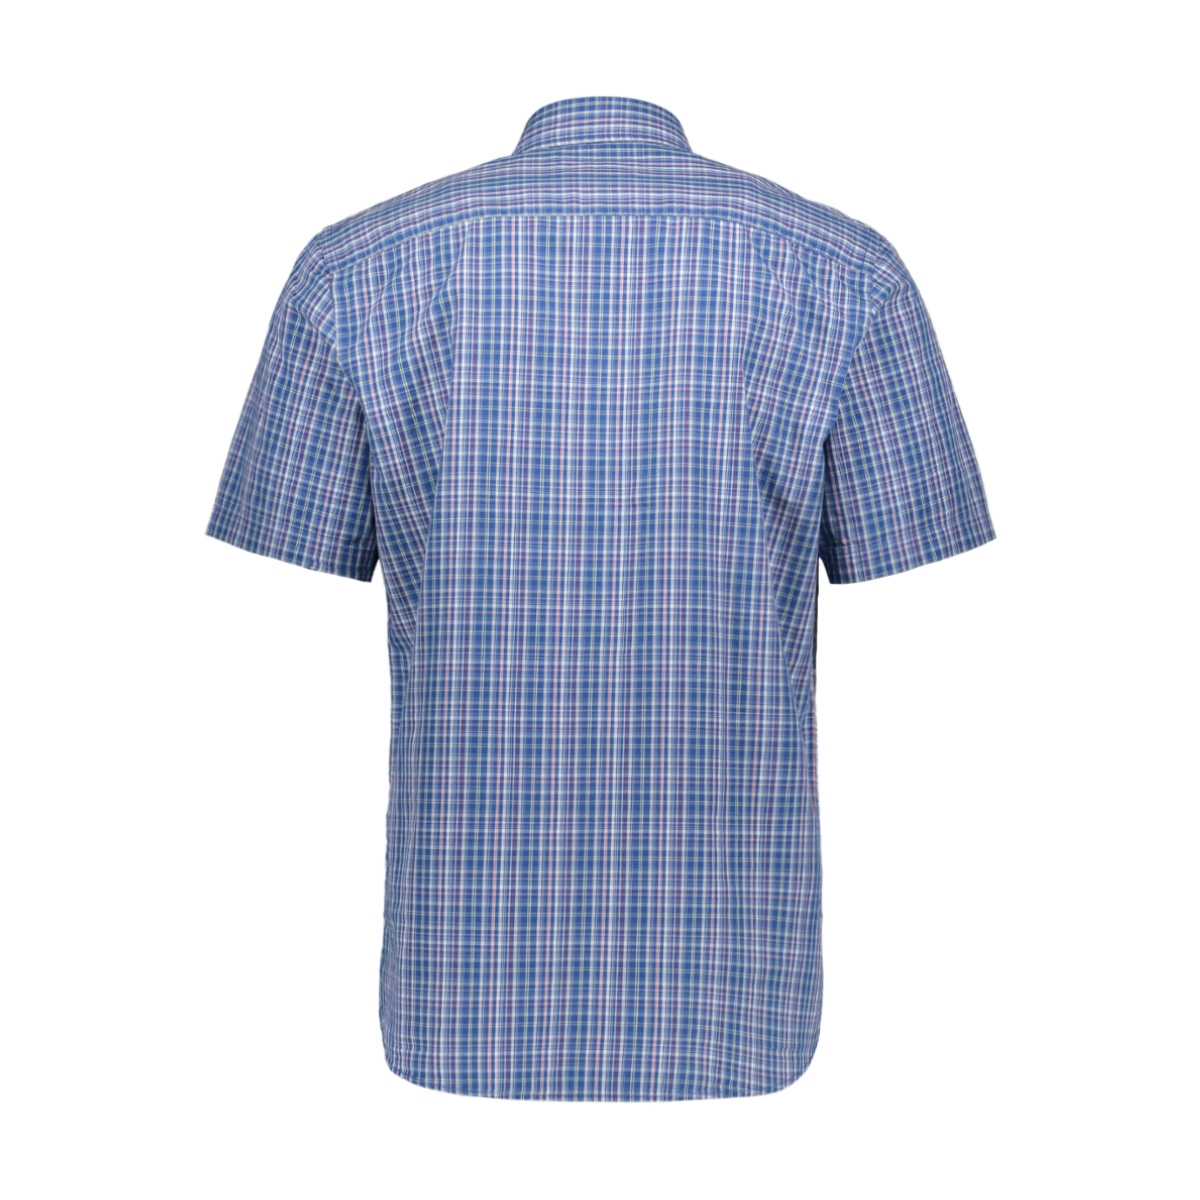 geruit overhemd 39009 3202 dnr overhemd 79 blauw combi